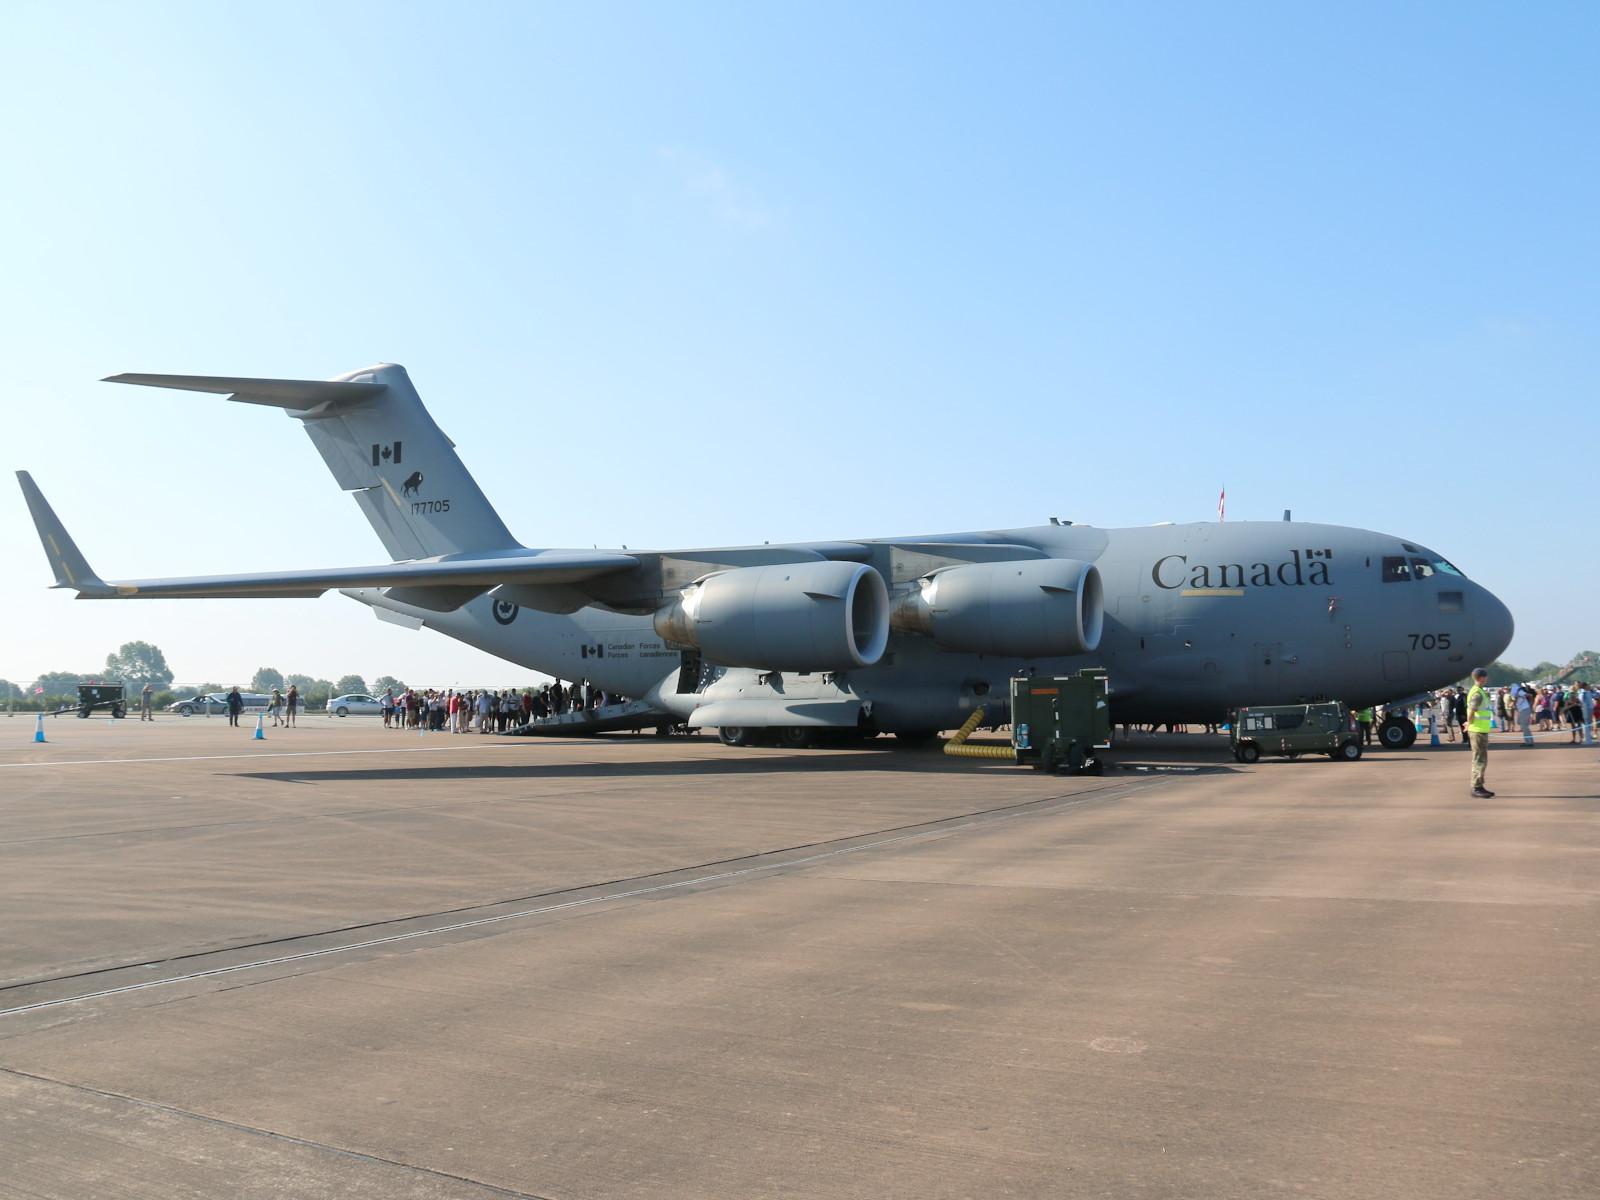 Boeing CC-177 Globemaster (C-17) aus Kanada © Doppeladler.com